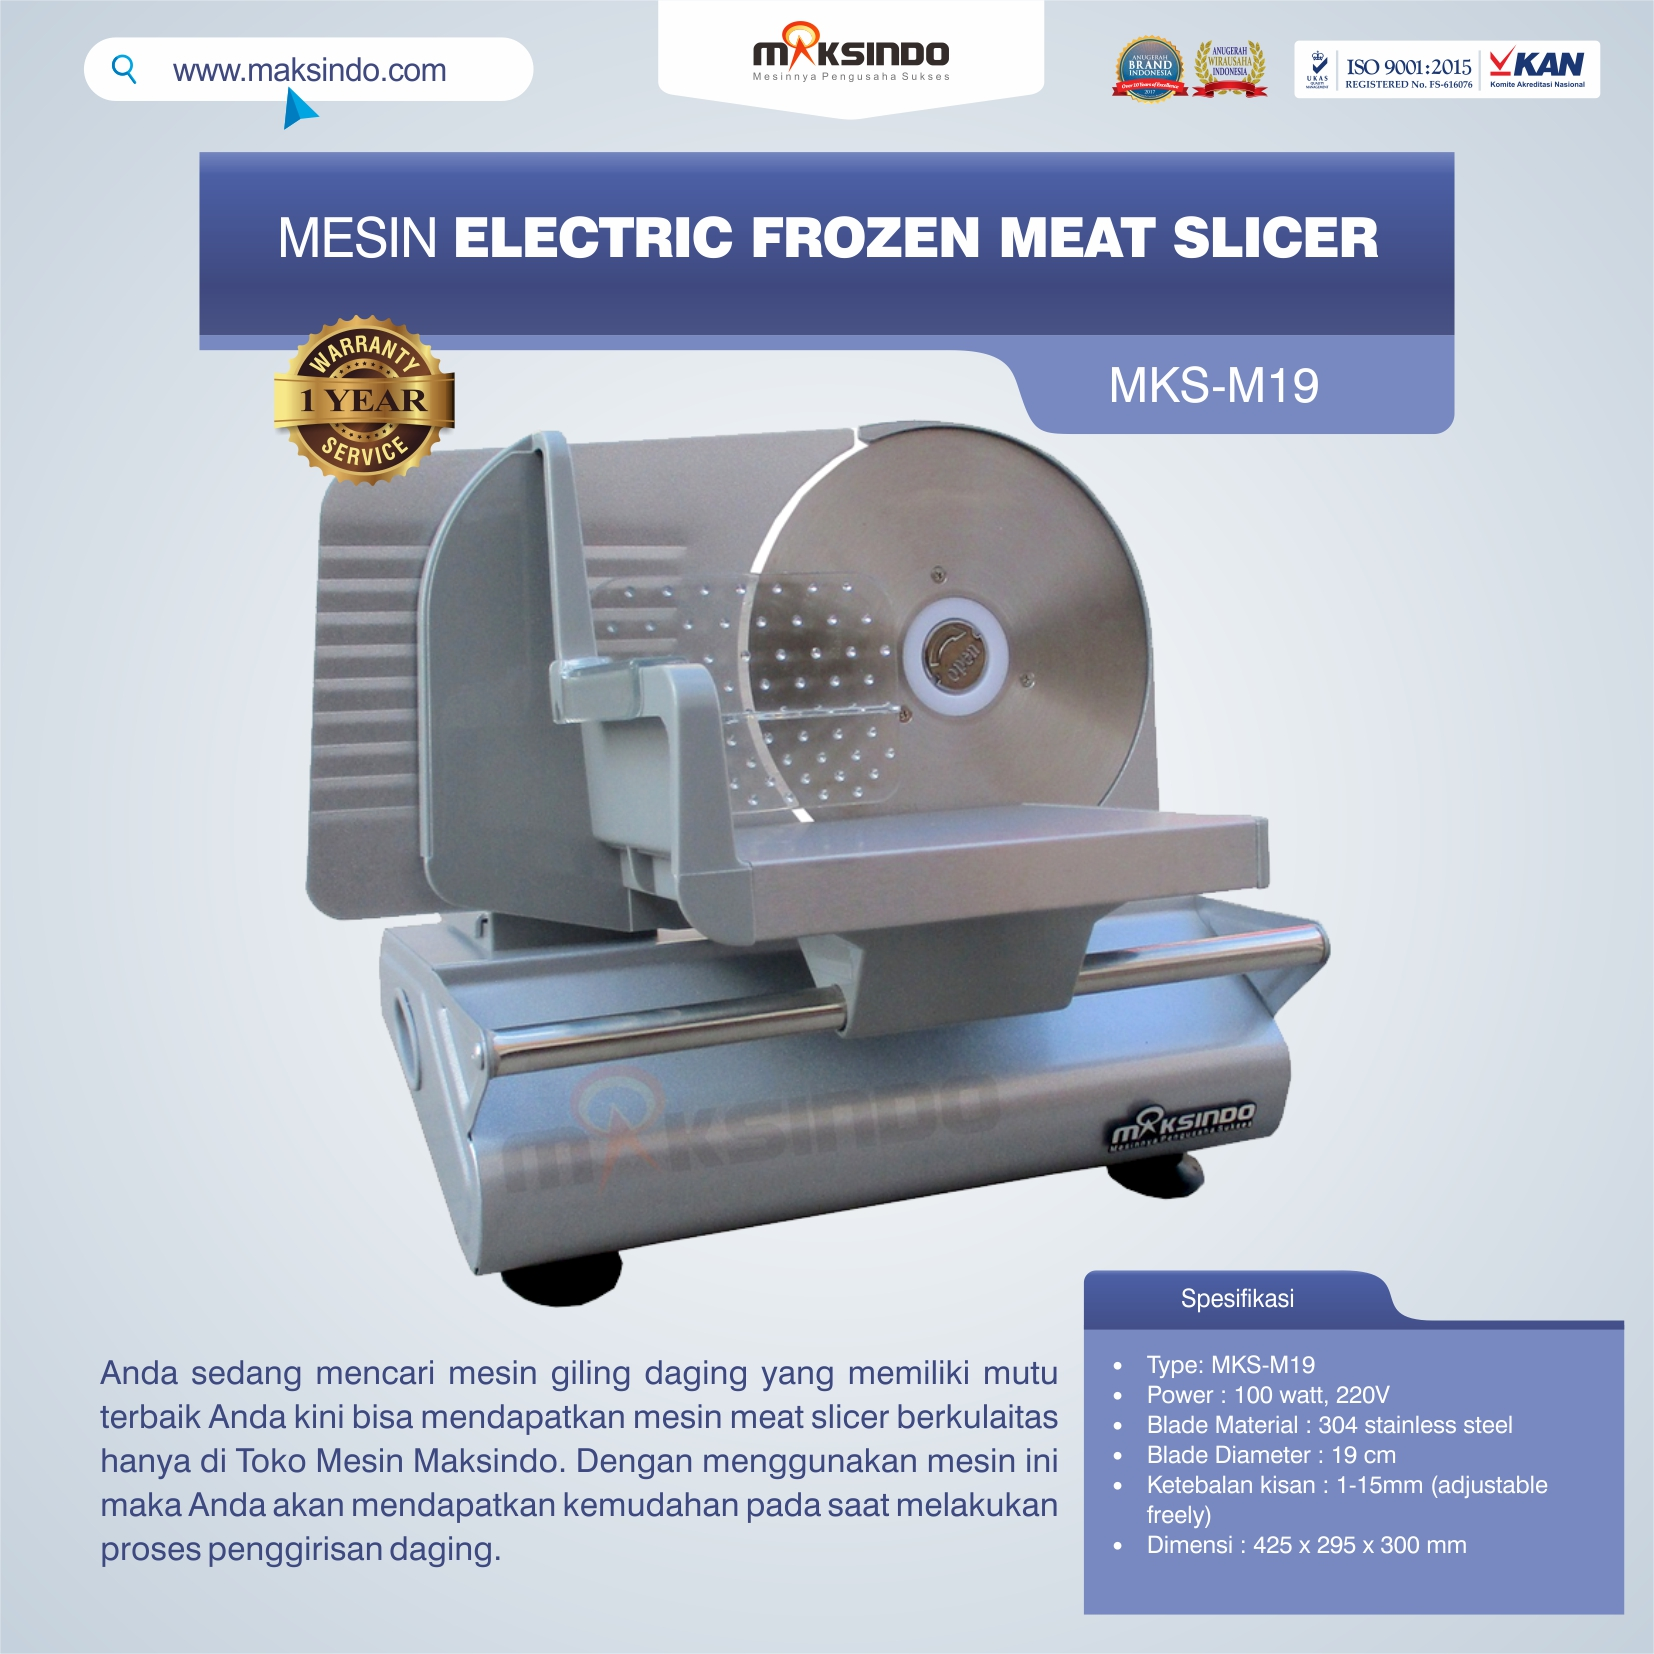 Jual MesinElectric Frozen Meat SlicerMKS-M19 di Bali